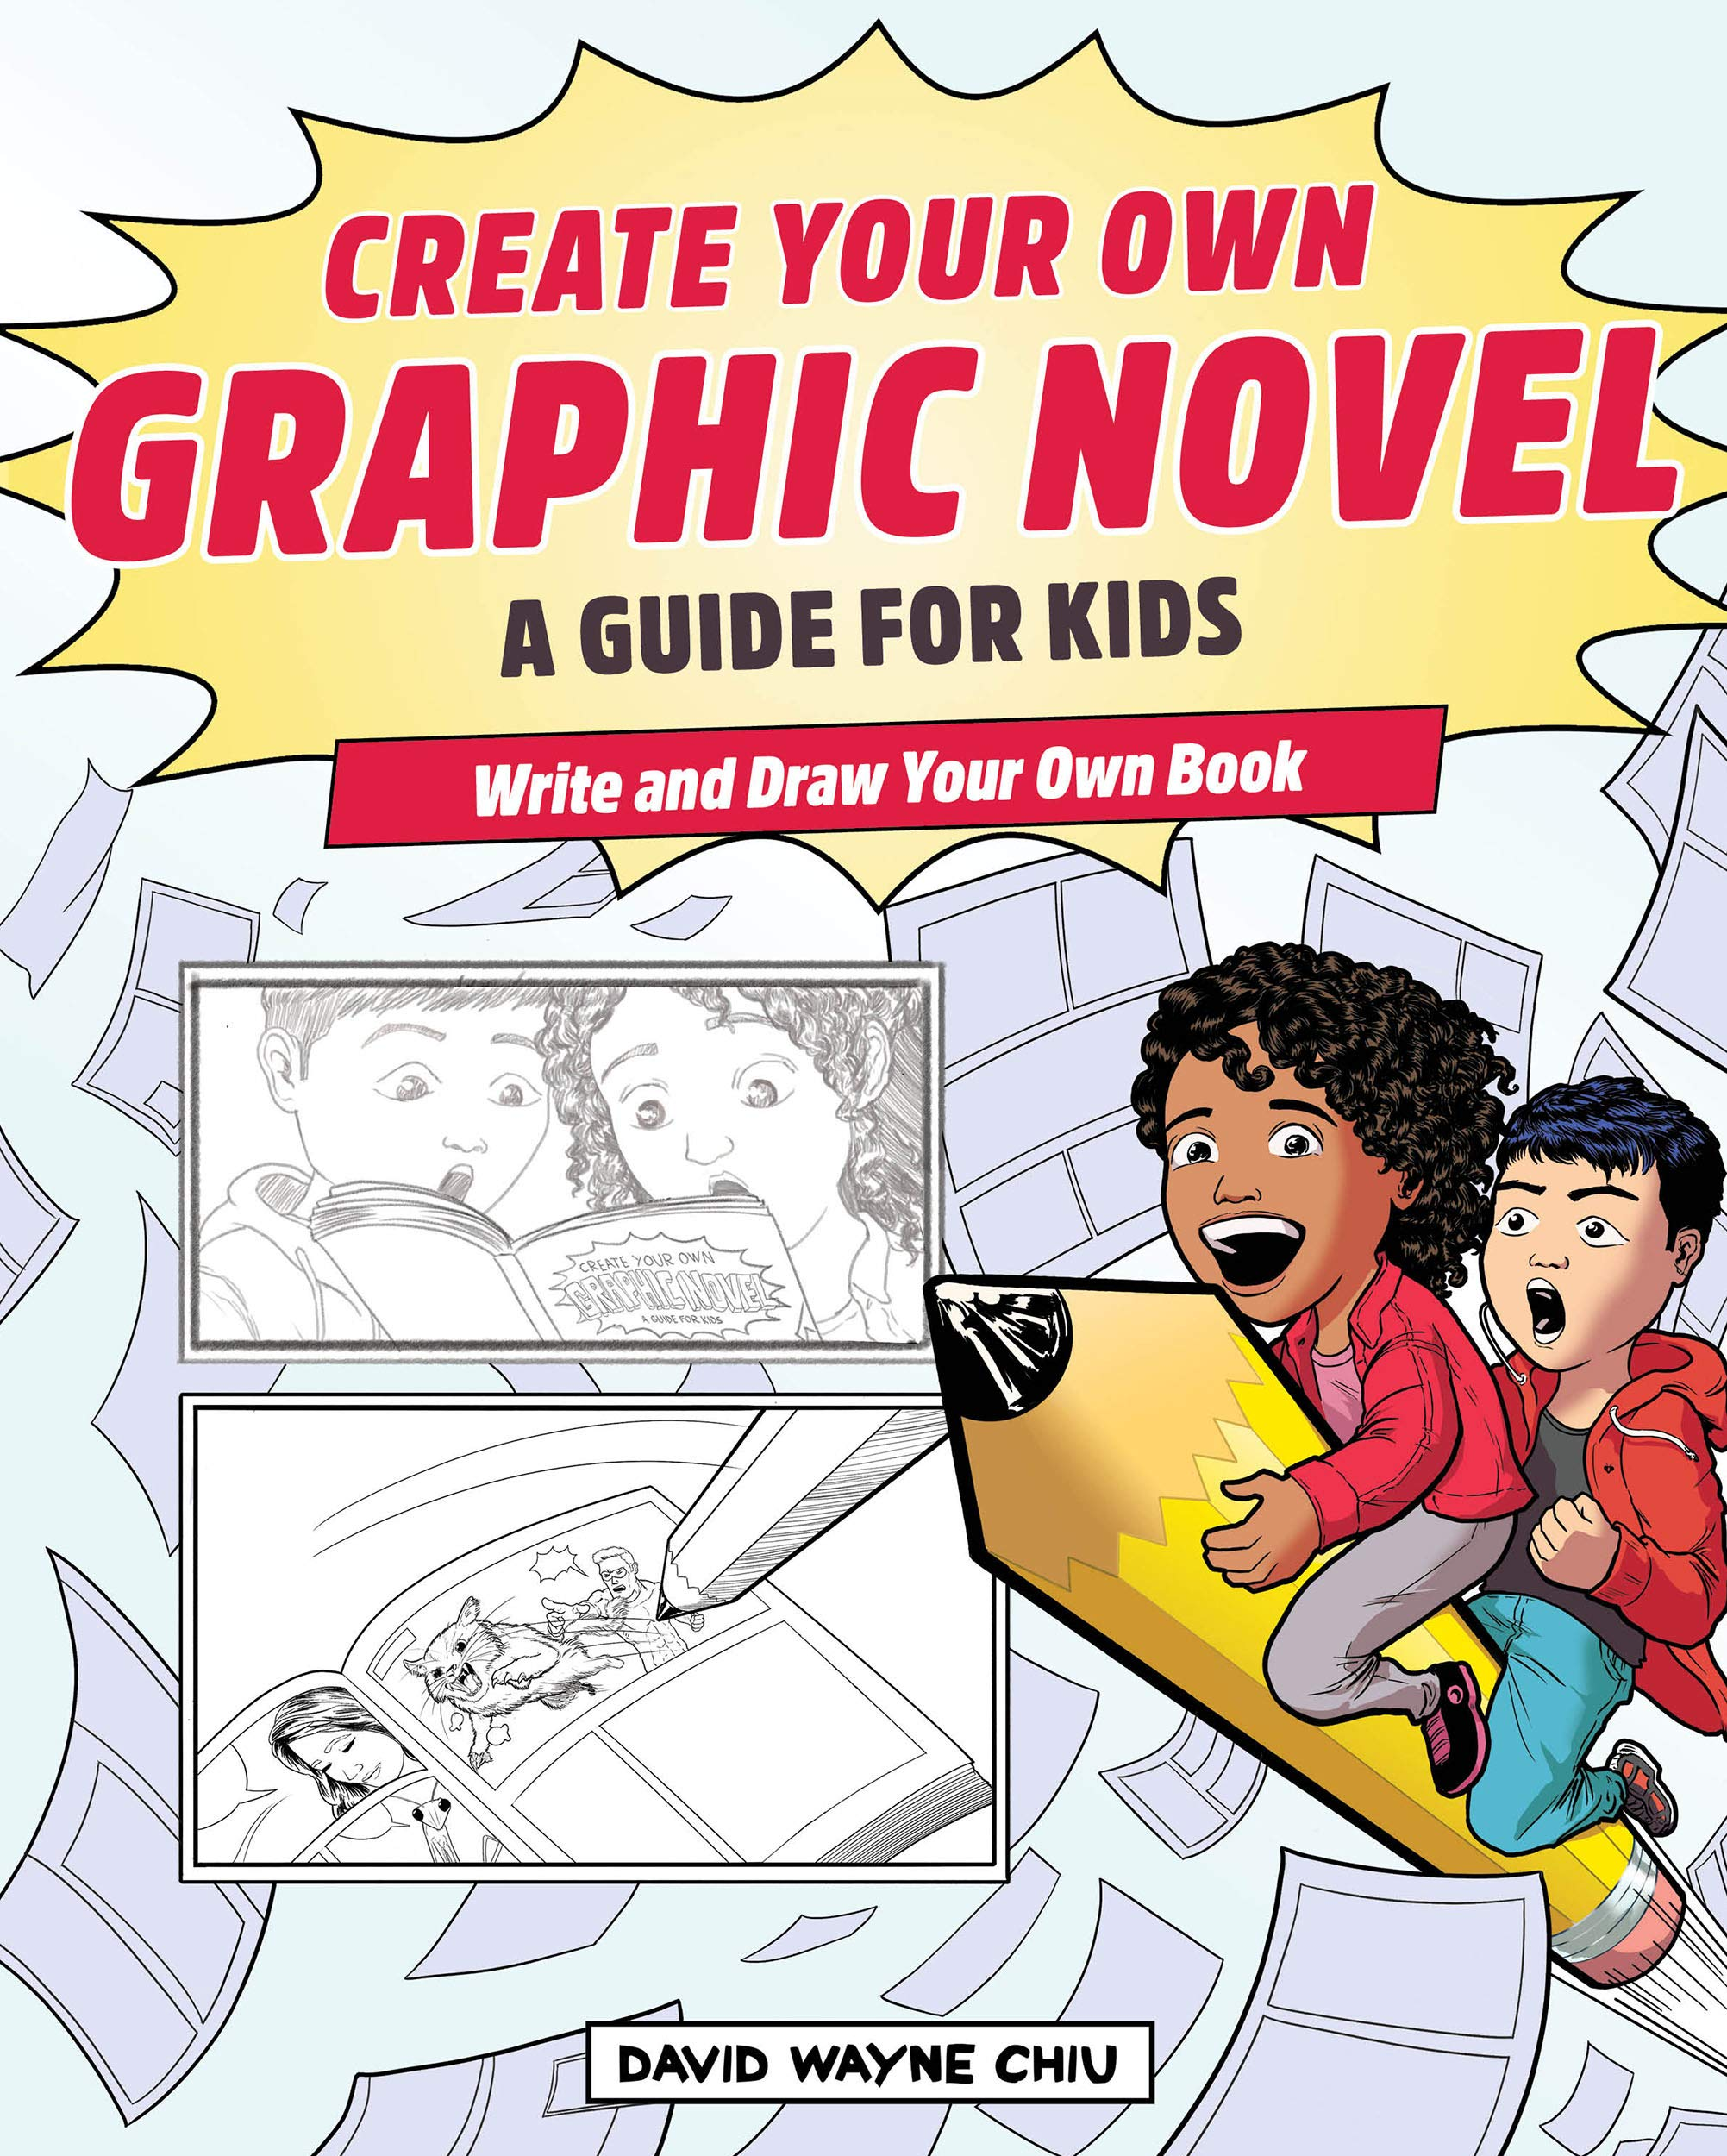 How to write comic books for kids call center resume sample india